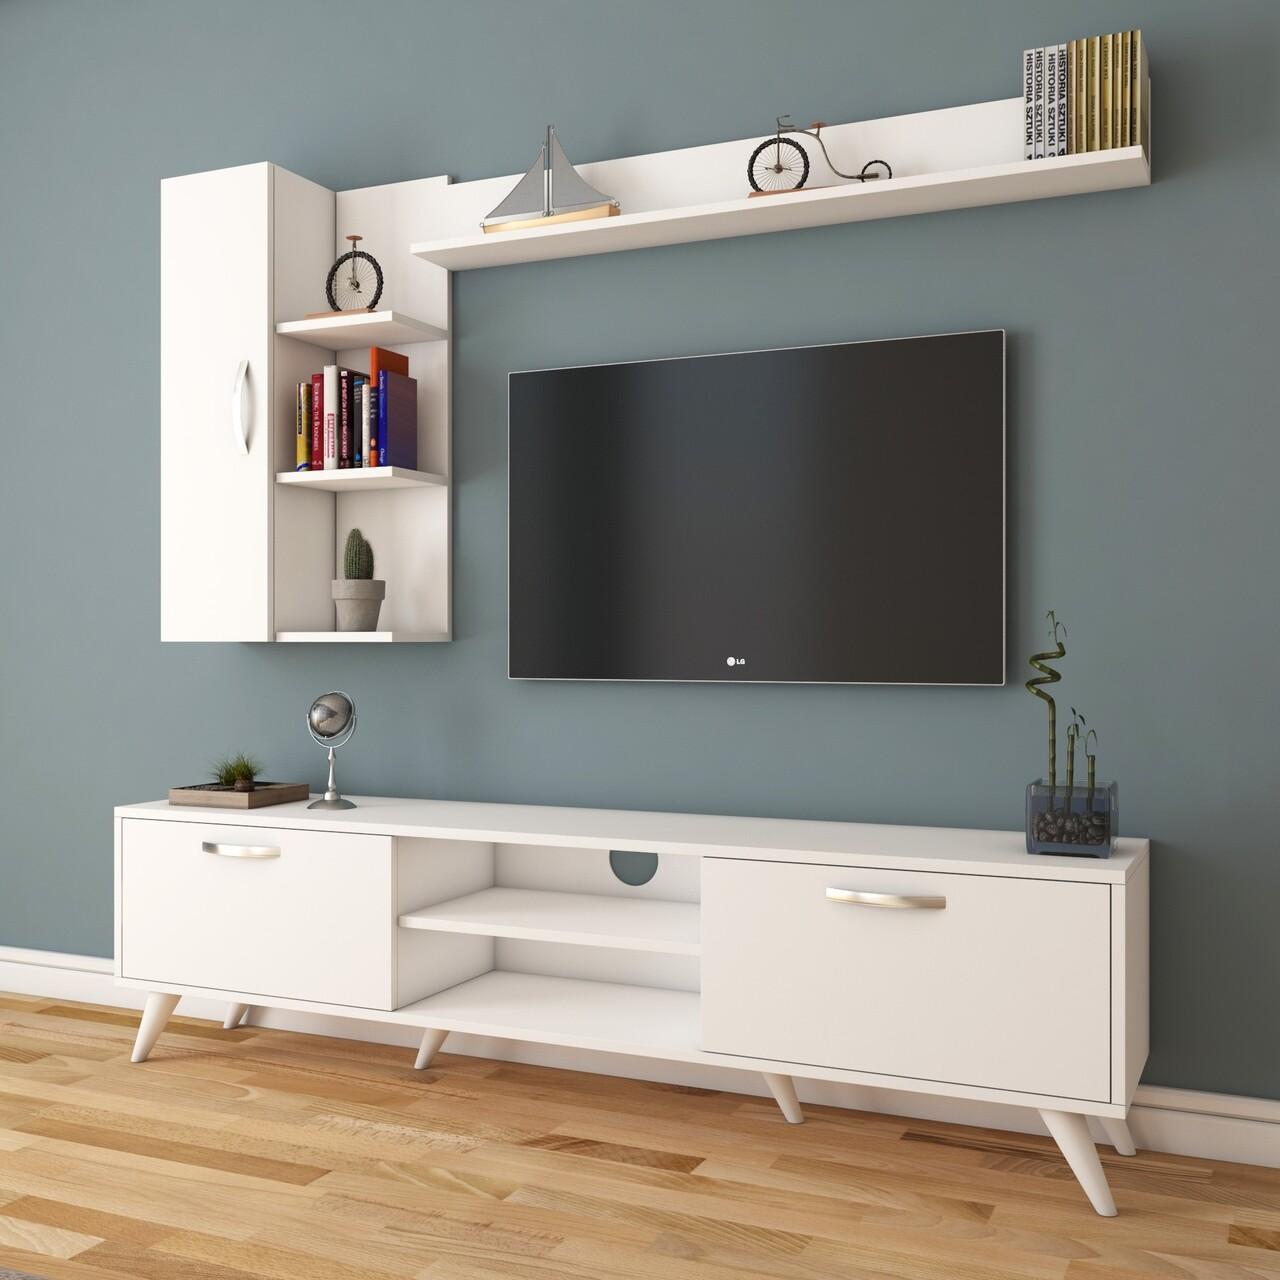 Comoda TV cu 2 rafturi de perete si cabinet M36 - 299, Wren, 180 x 35 x 48.6 cm/90 cm/133 cm, white